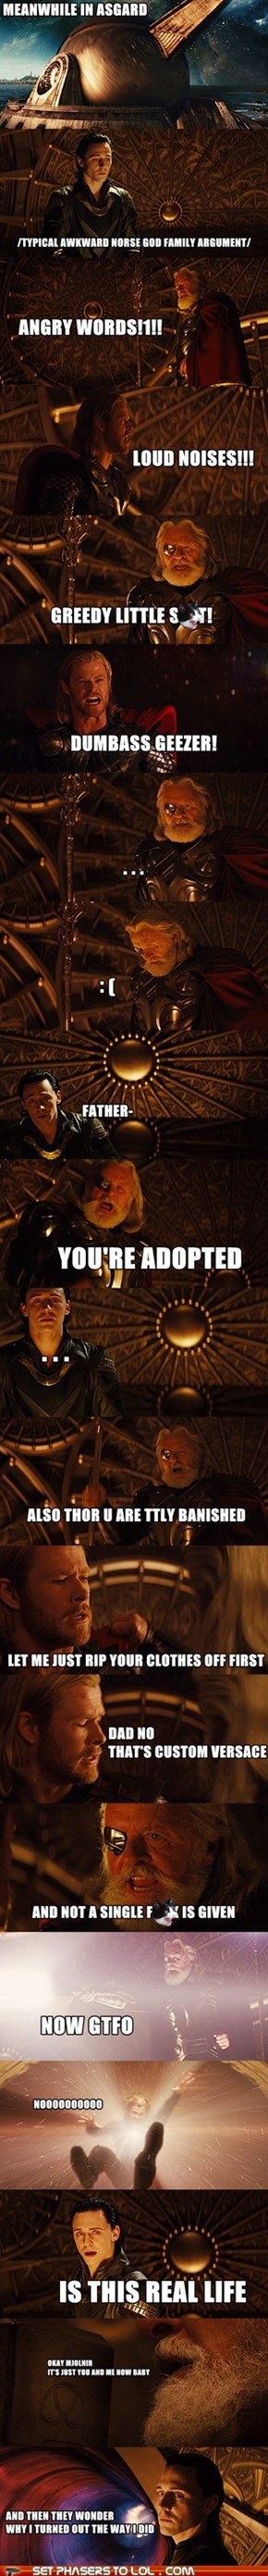 Thor - Family Drama in Asgard